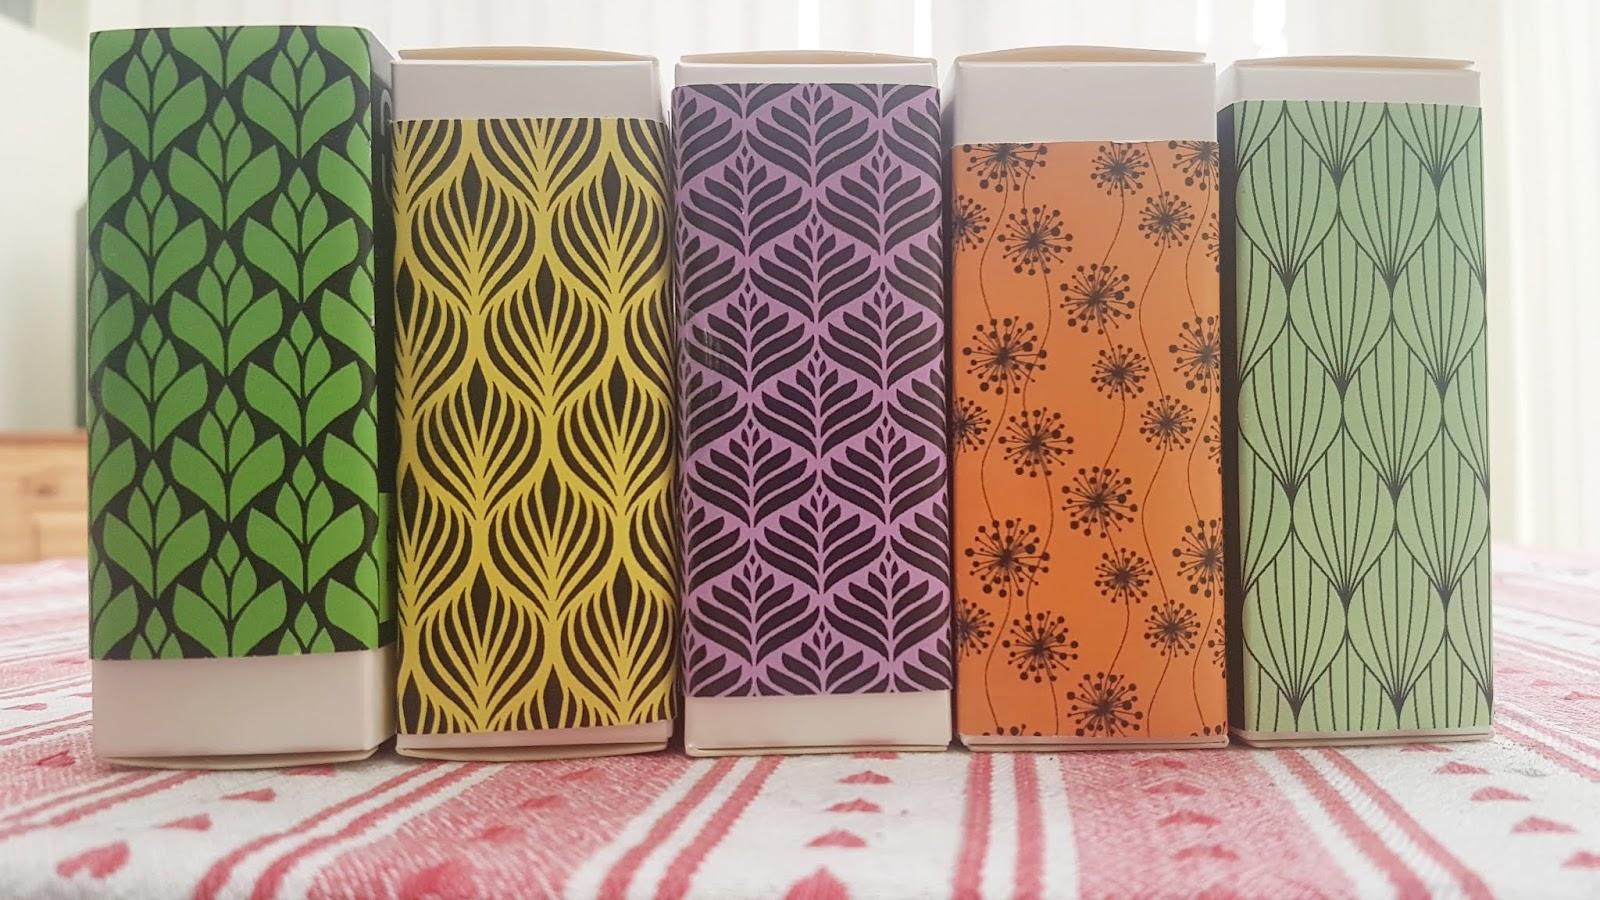 Mallow + White soaps review plastic free boxes